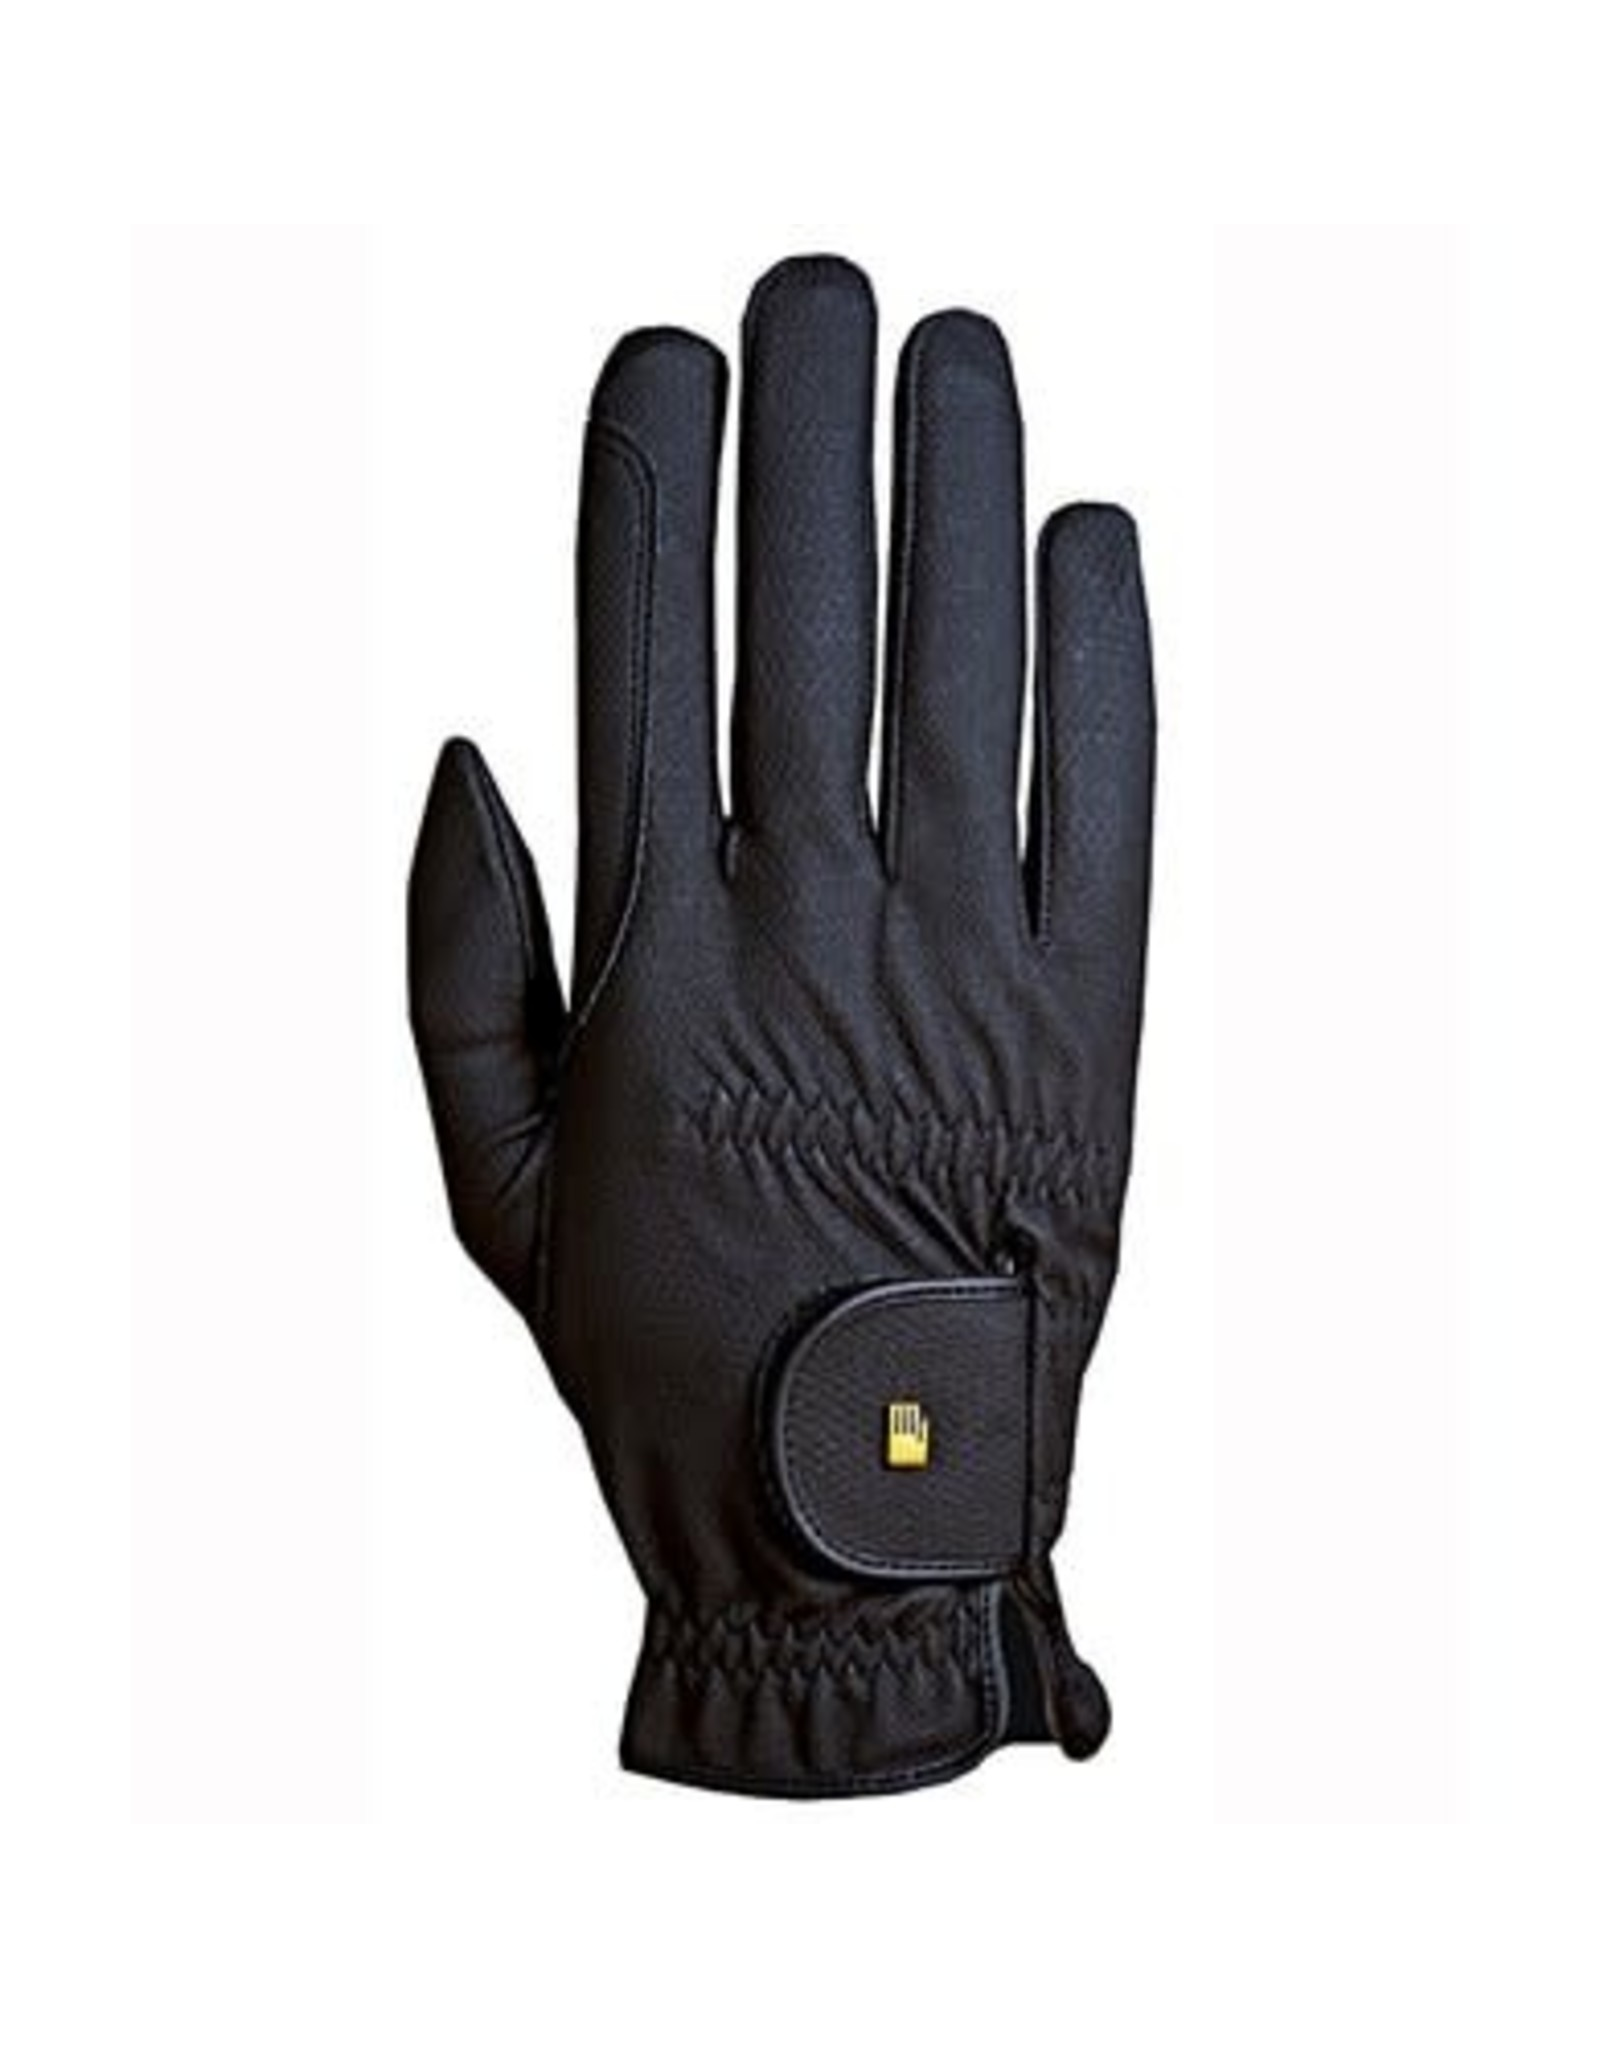 Roeckl Roeckl handschoenen Winter Zwart